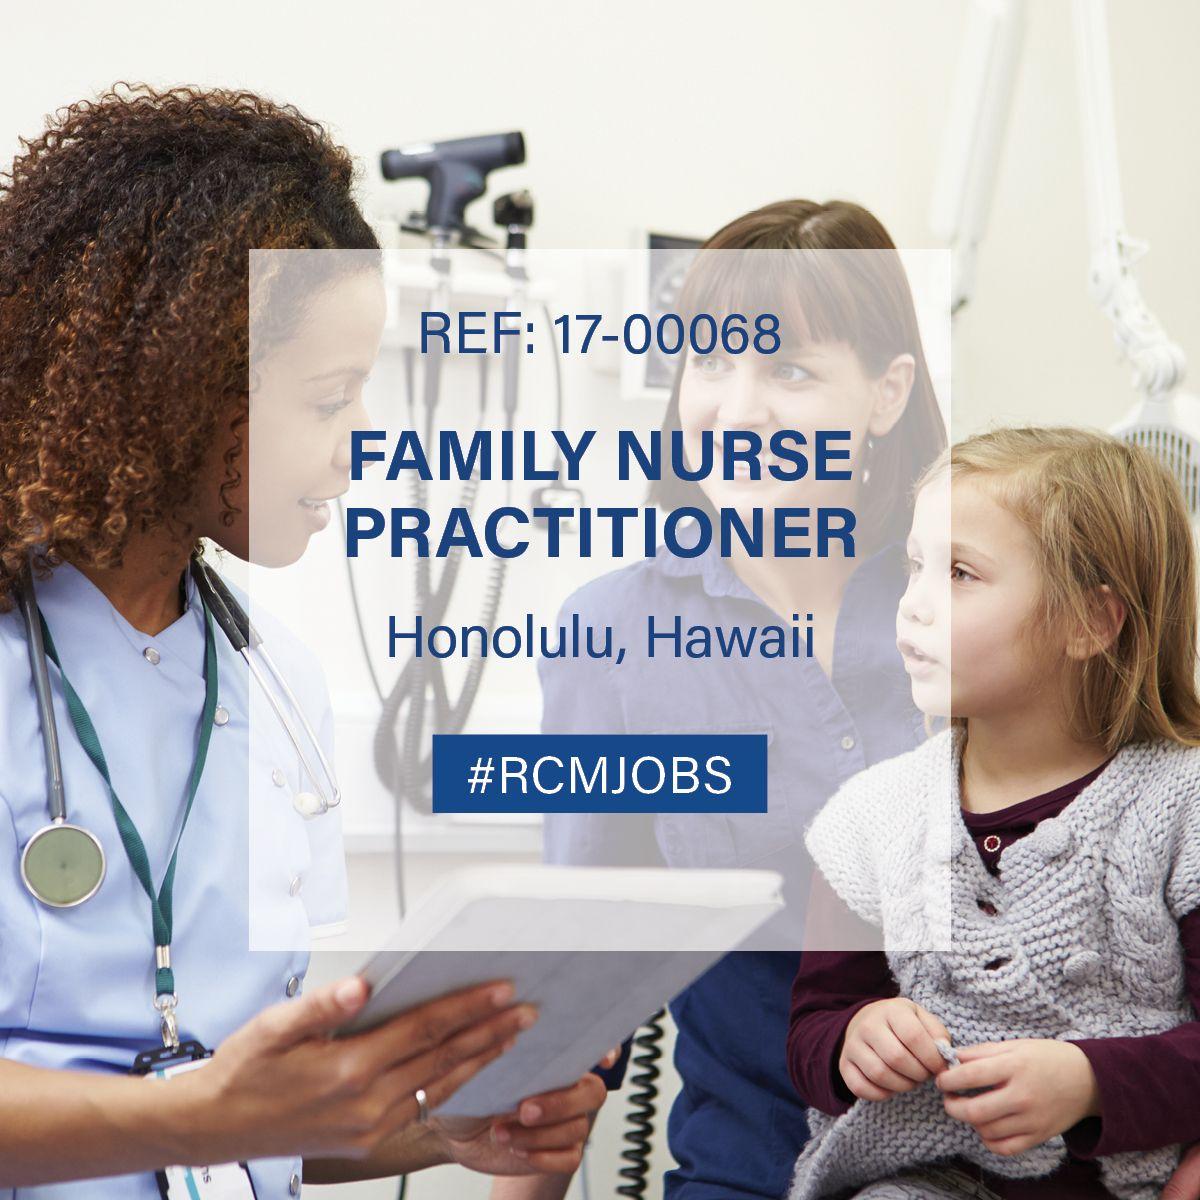 rcmjobs jobs careers careeradvice healthcare